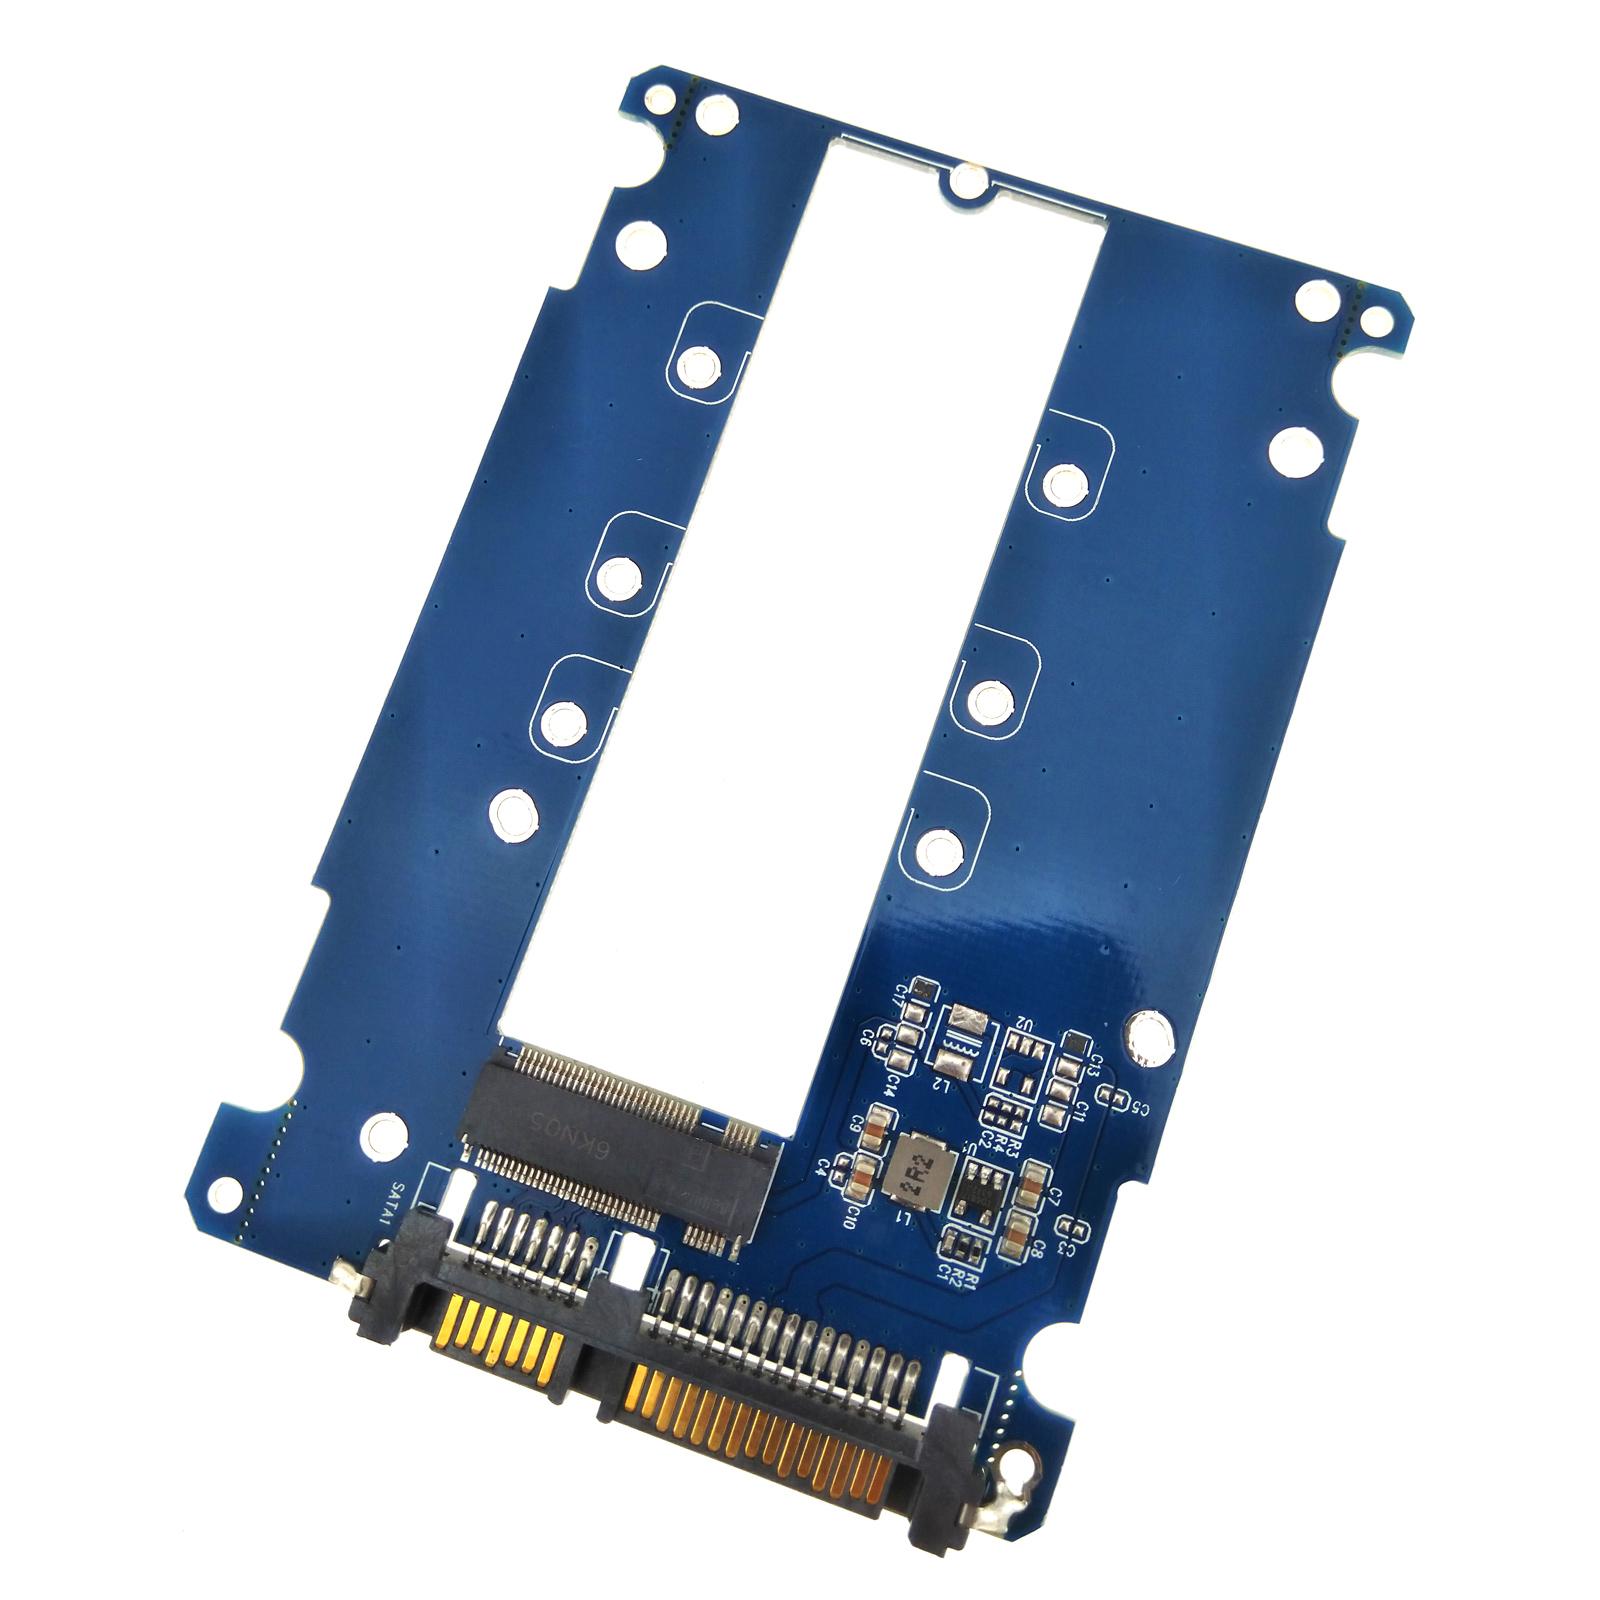 Locking Latch Cable B M Key NGFF M2 SSD Dual Slot to SATA PCI-e Adapter Card